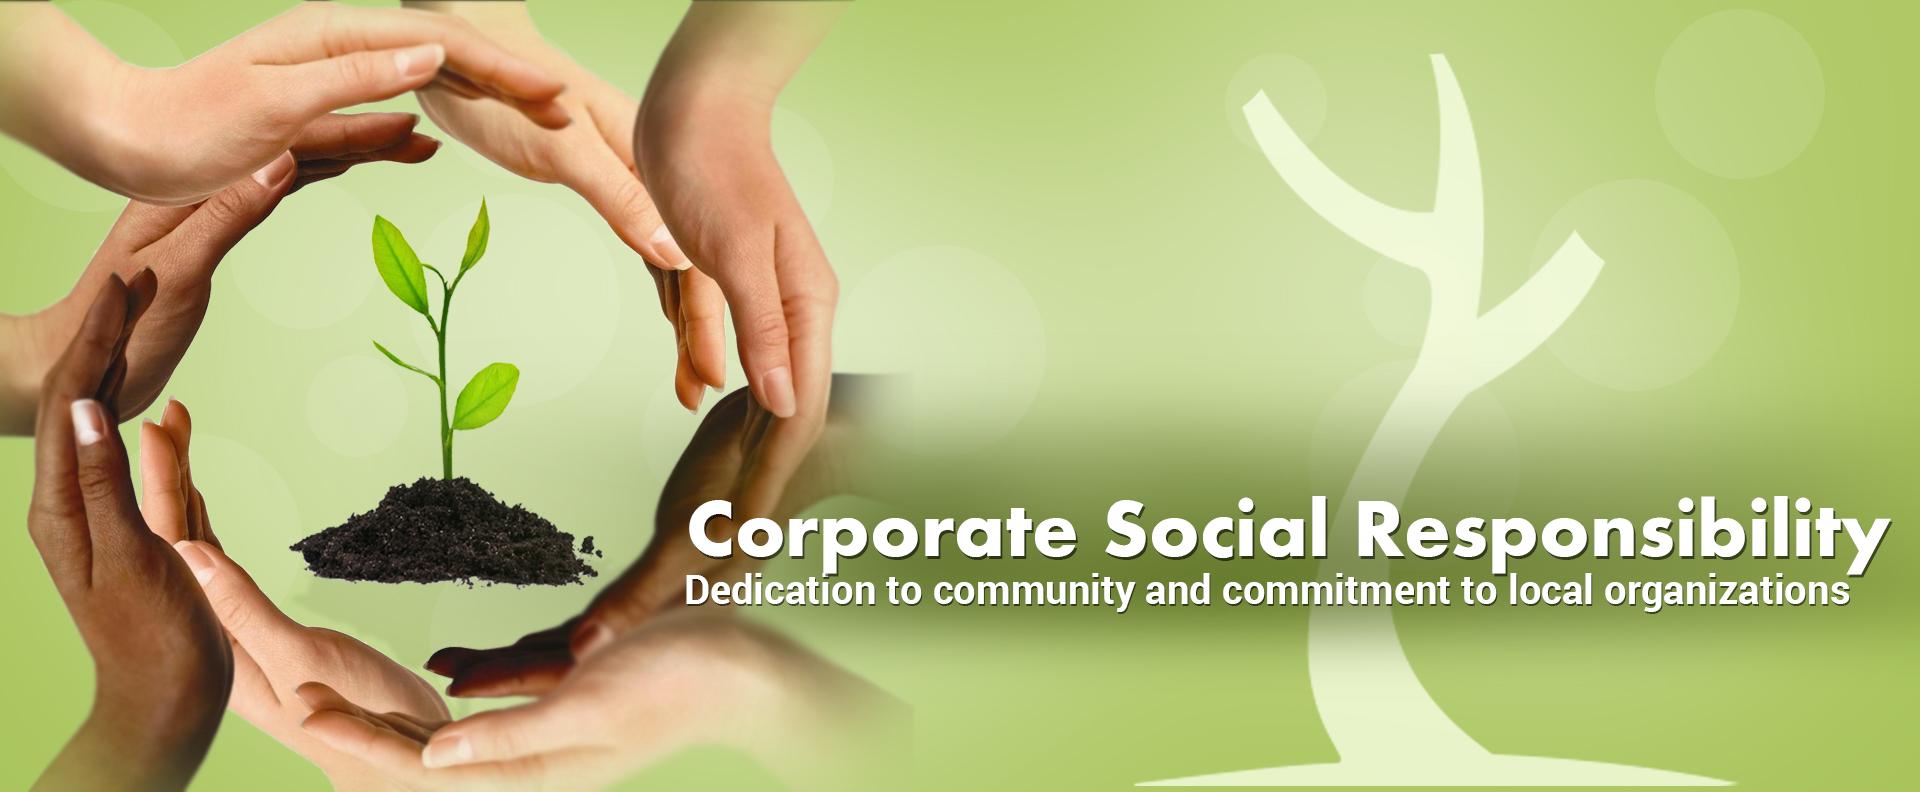 http://infonextech.com/services/general/social-responsibility